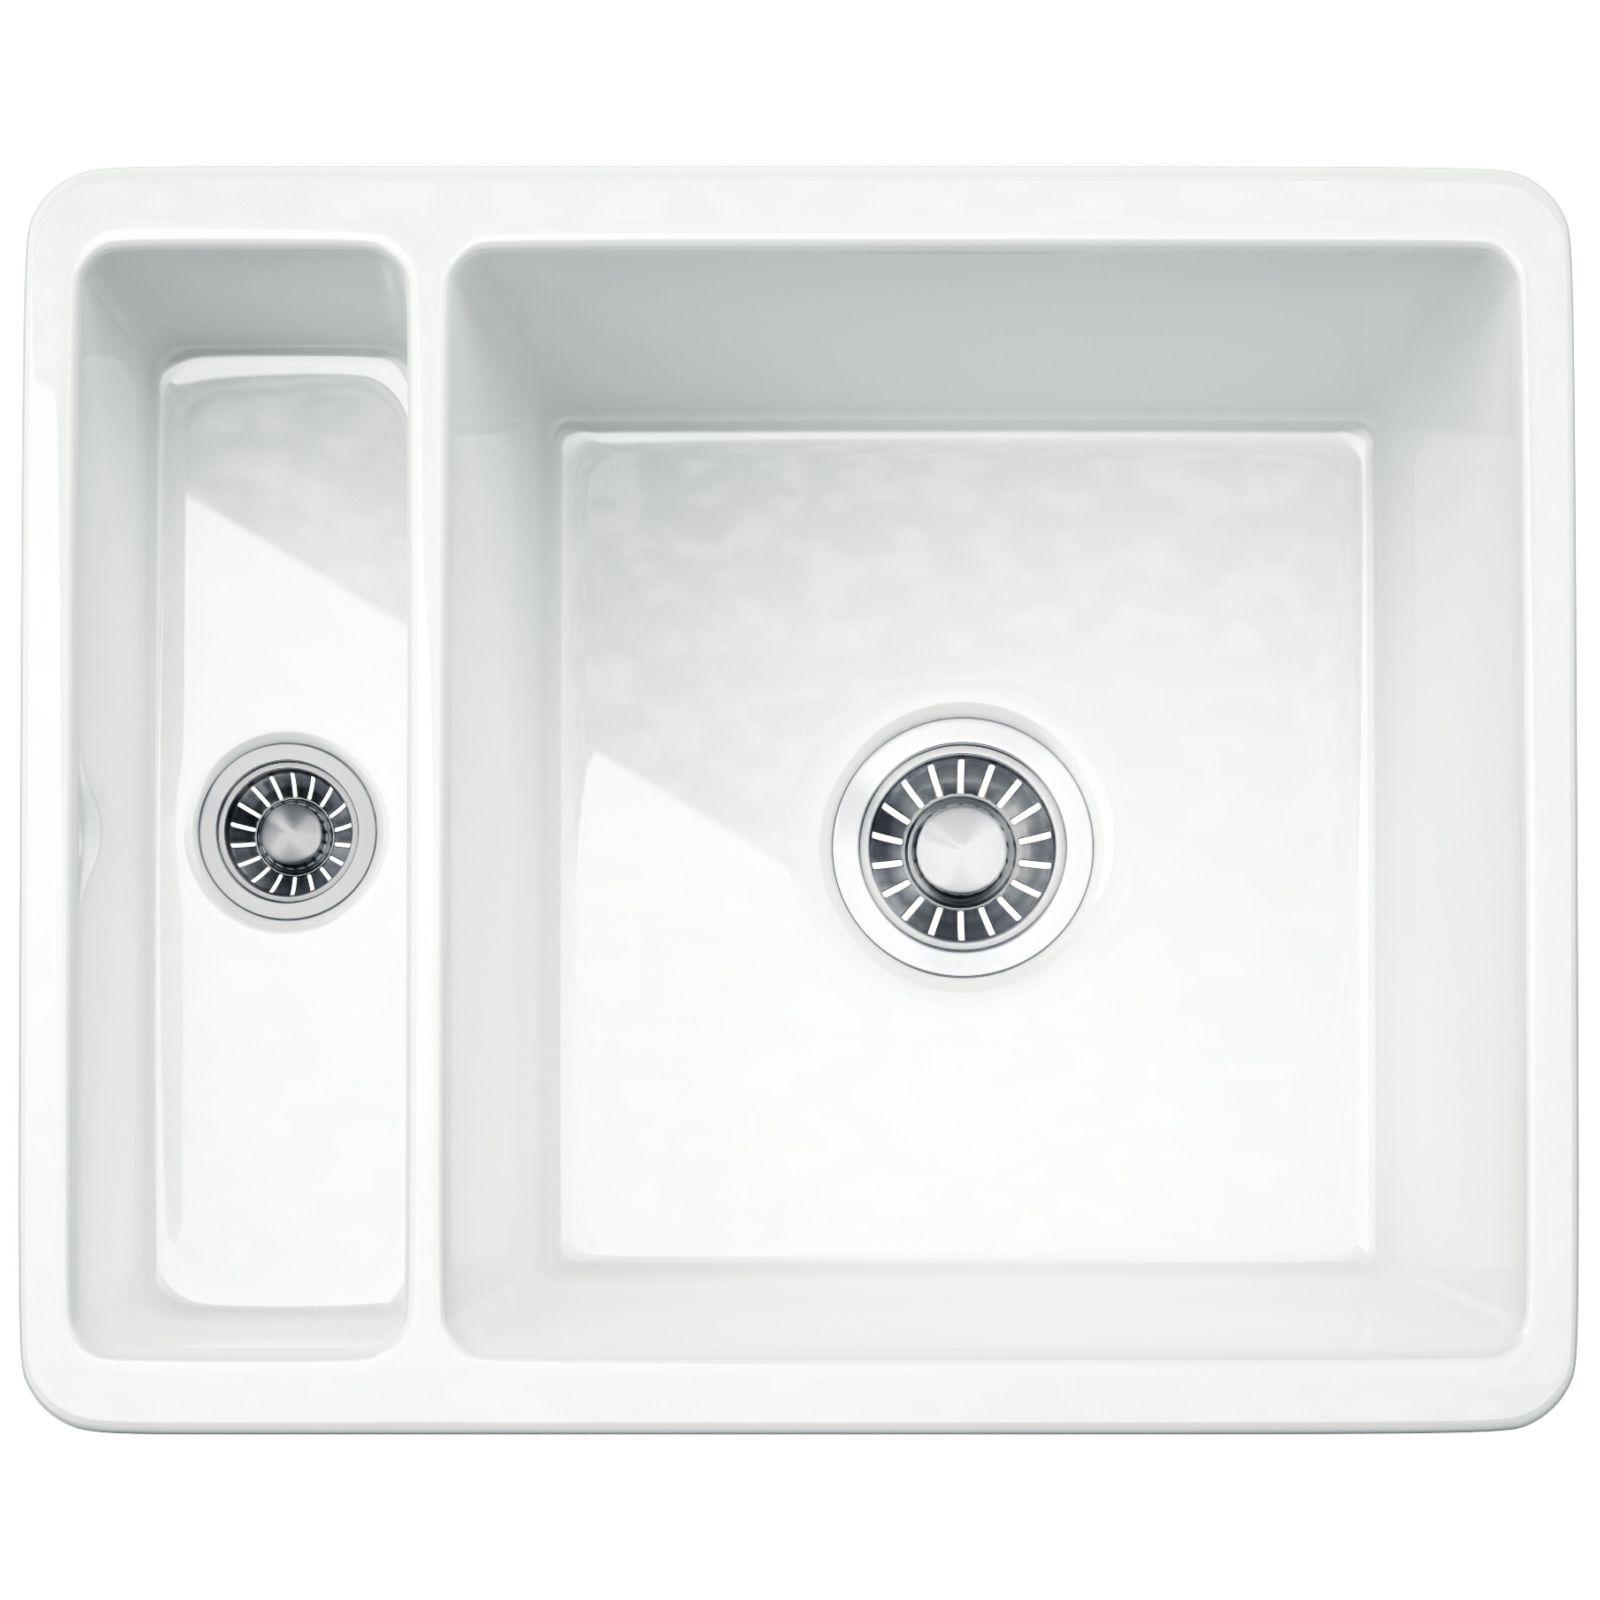 Franke Undermount Ceramic Kitchen Sinks | http://yonkou-tei.net ...